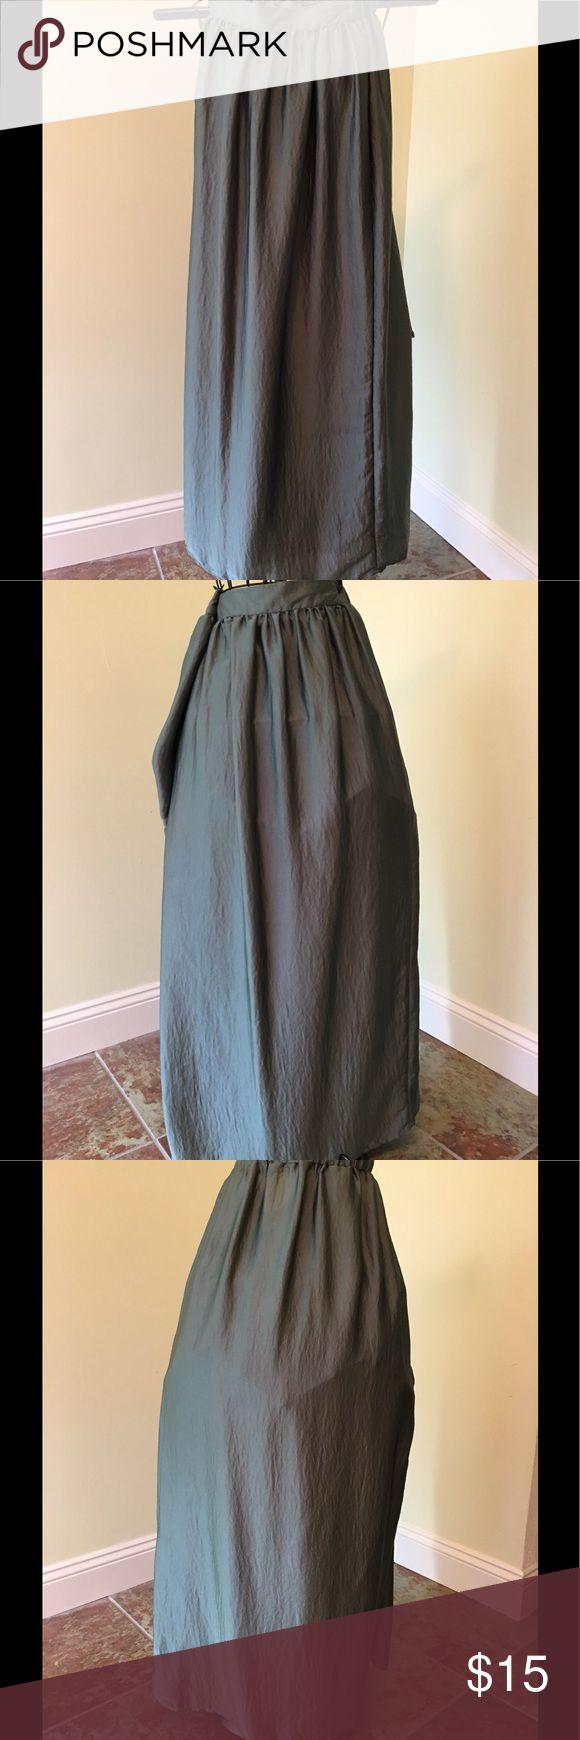 "Massimo Green Shiny satin long skirt For sale a Massimo 40"" long green shiny satin skirt. The skirt is new without tags. massimo Skirts Maxi"